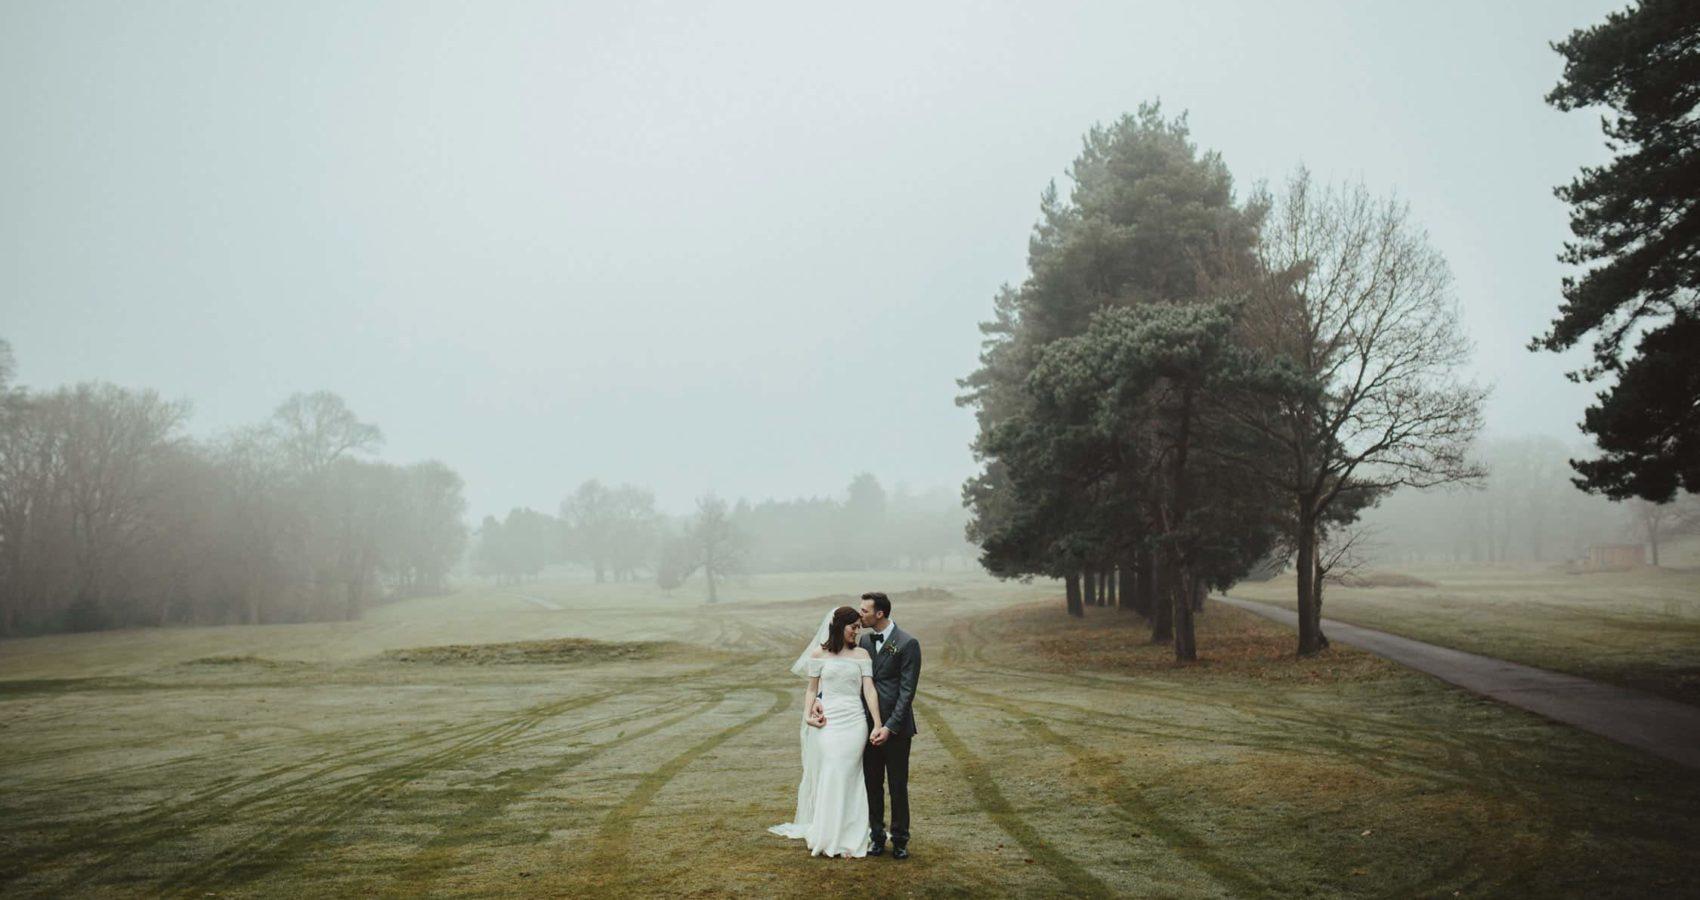 London based destination wedding photographers